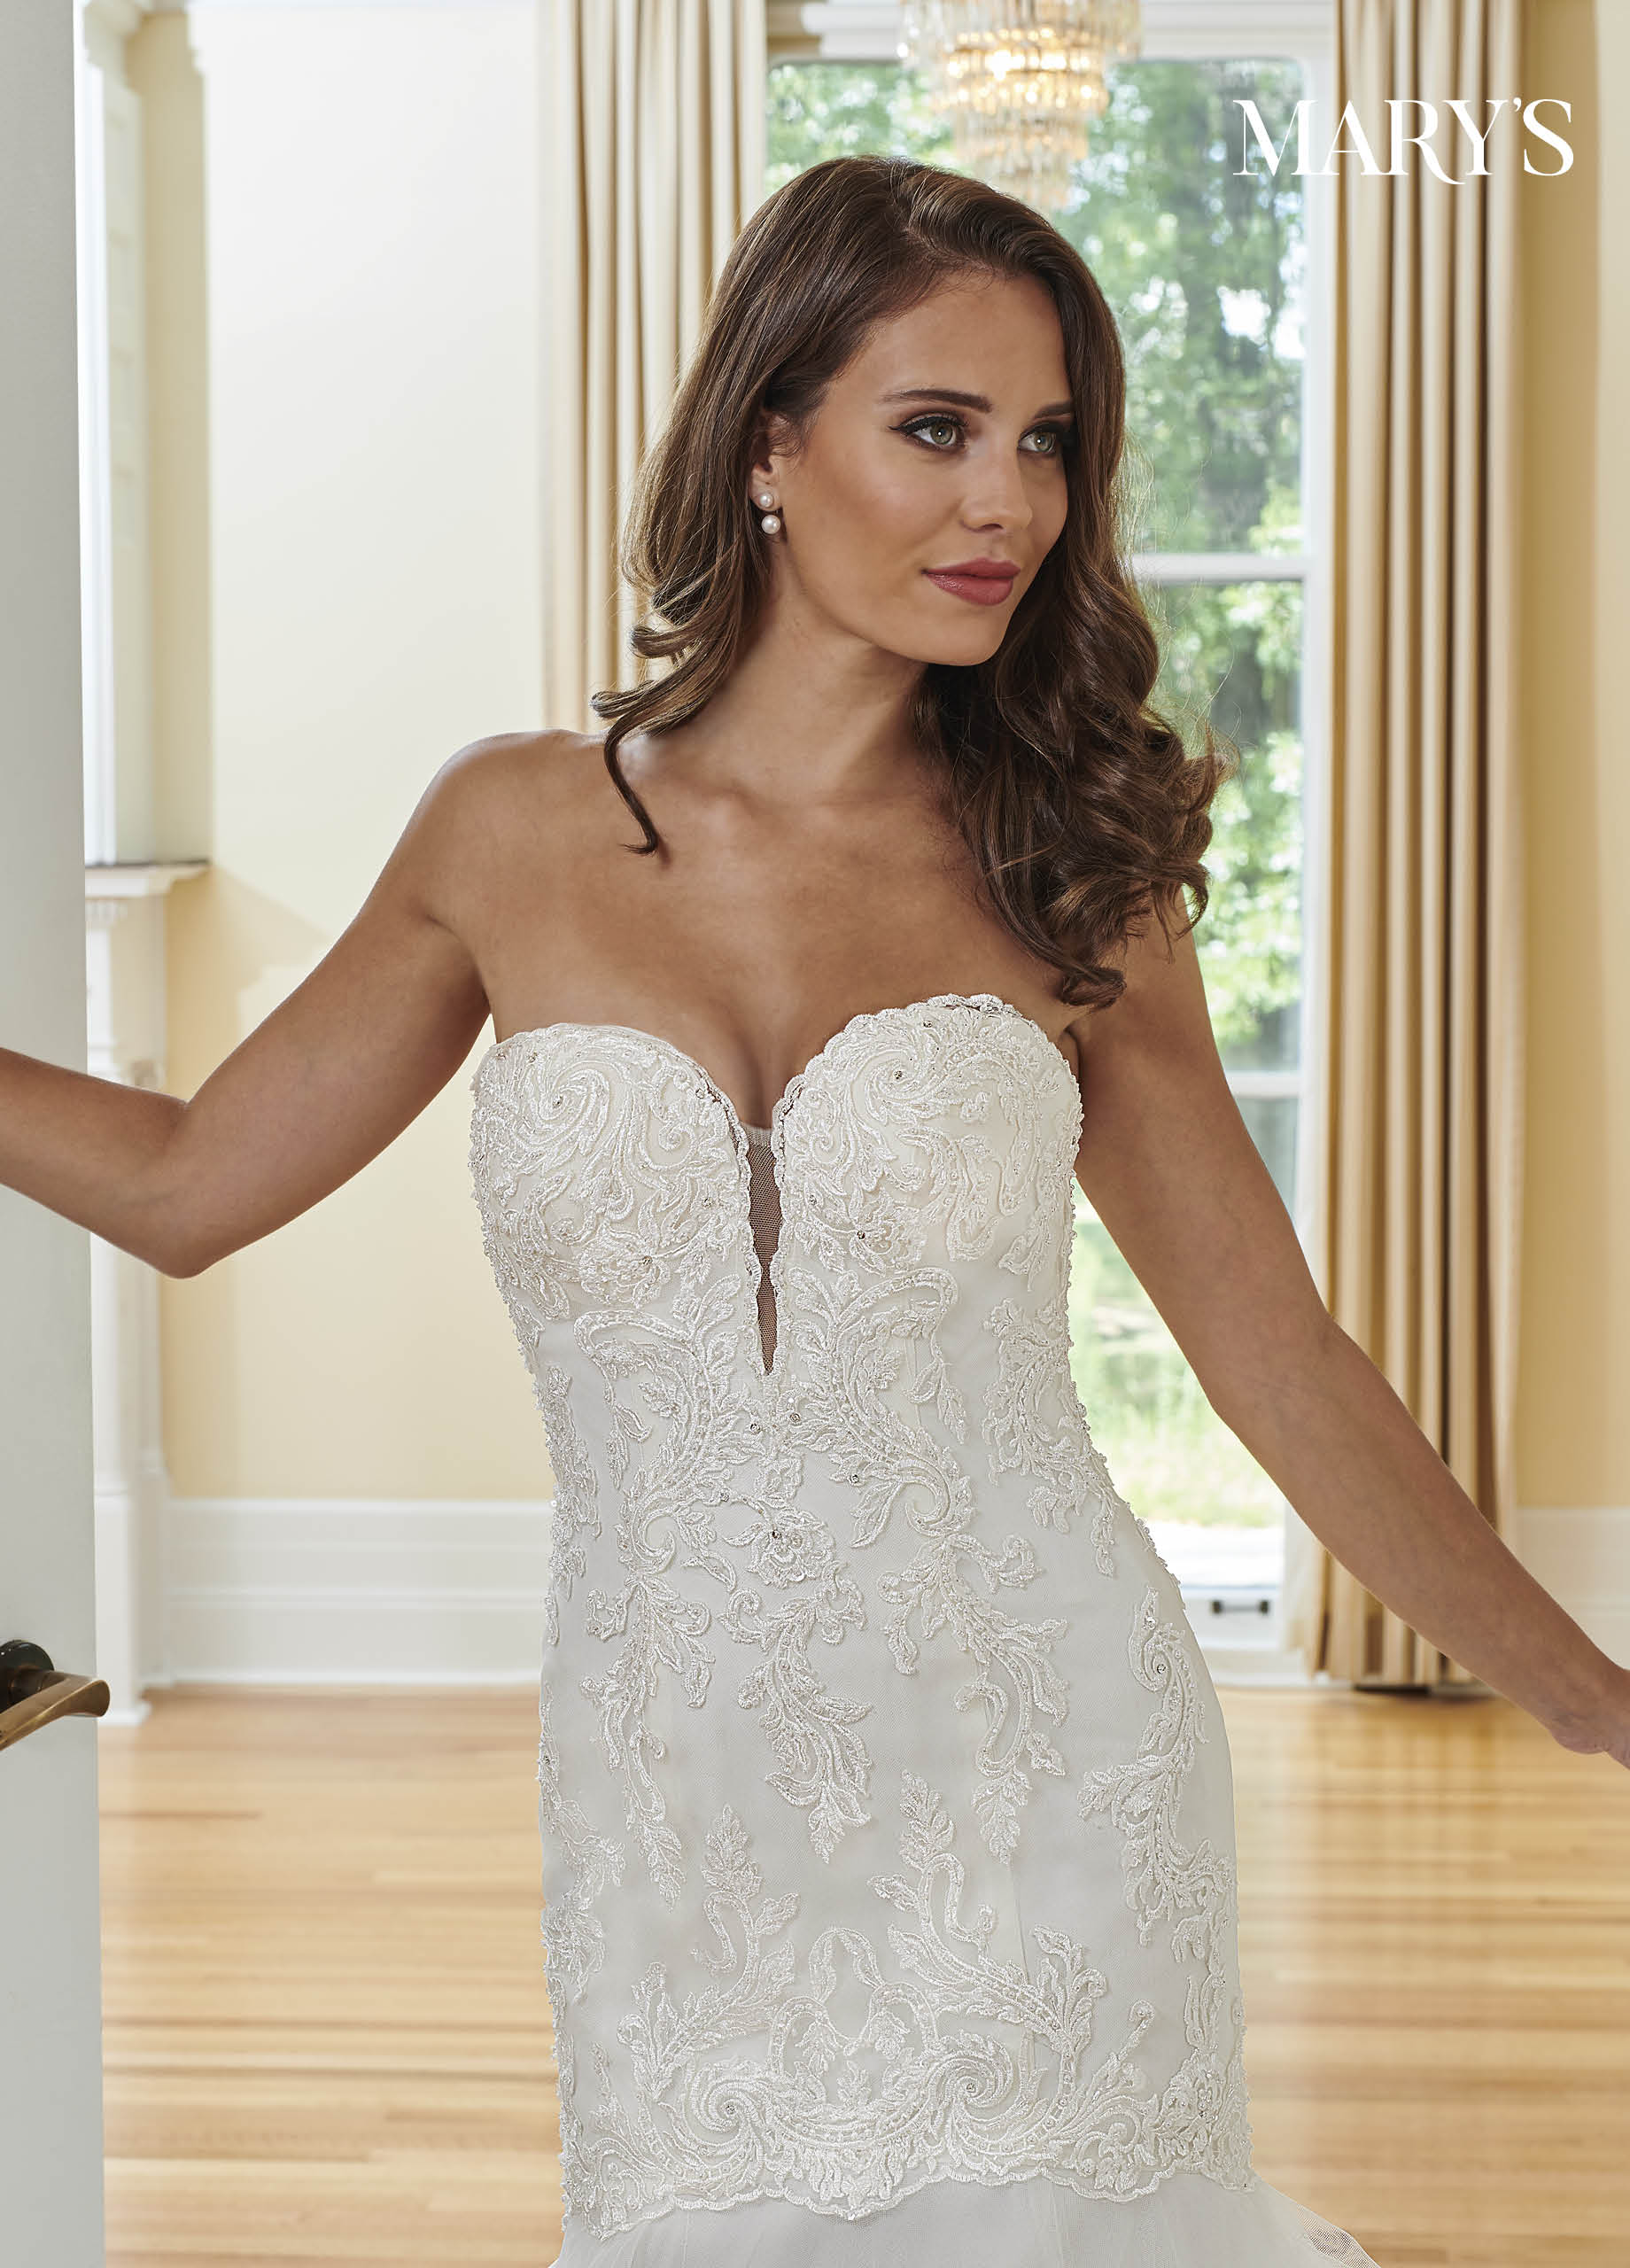 Bridal Wedding Dresses | Mary's | Style - MB3046